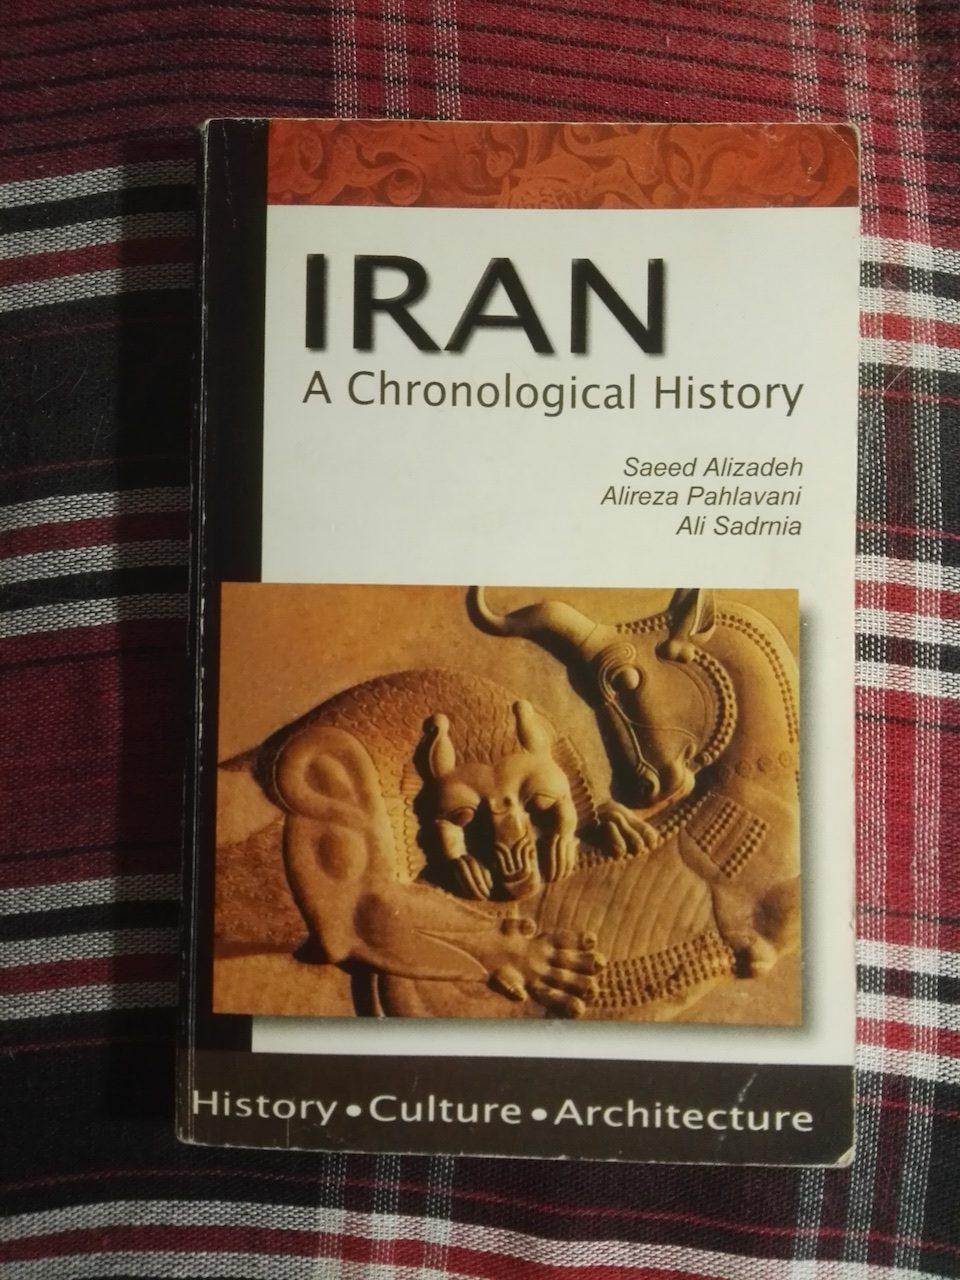 Saeed Alizadeh, Alireza Pahlavani, Ali Sadmia - Iran, A Chronological History